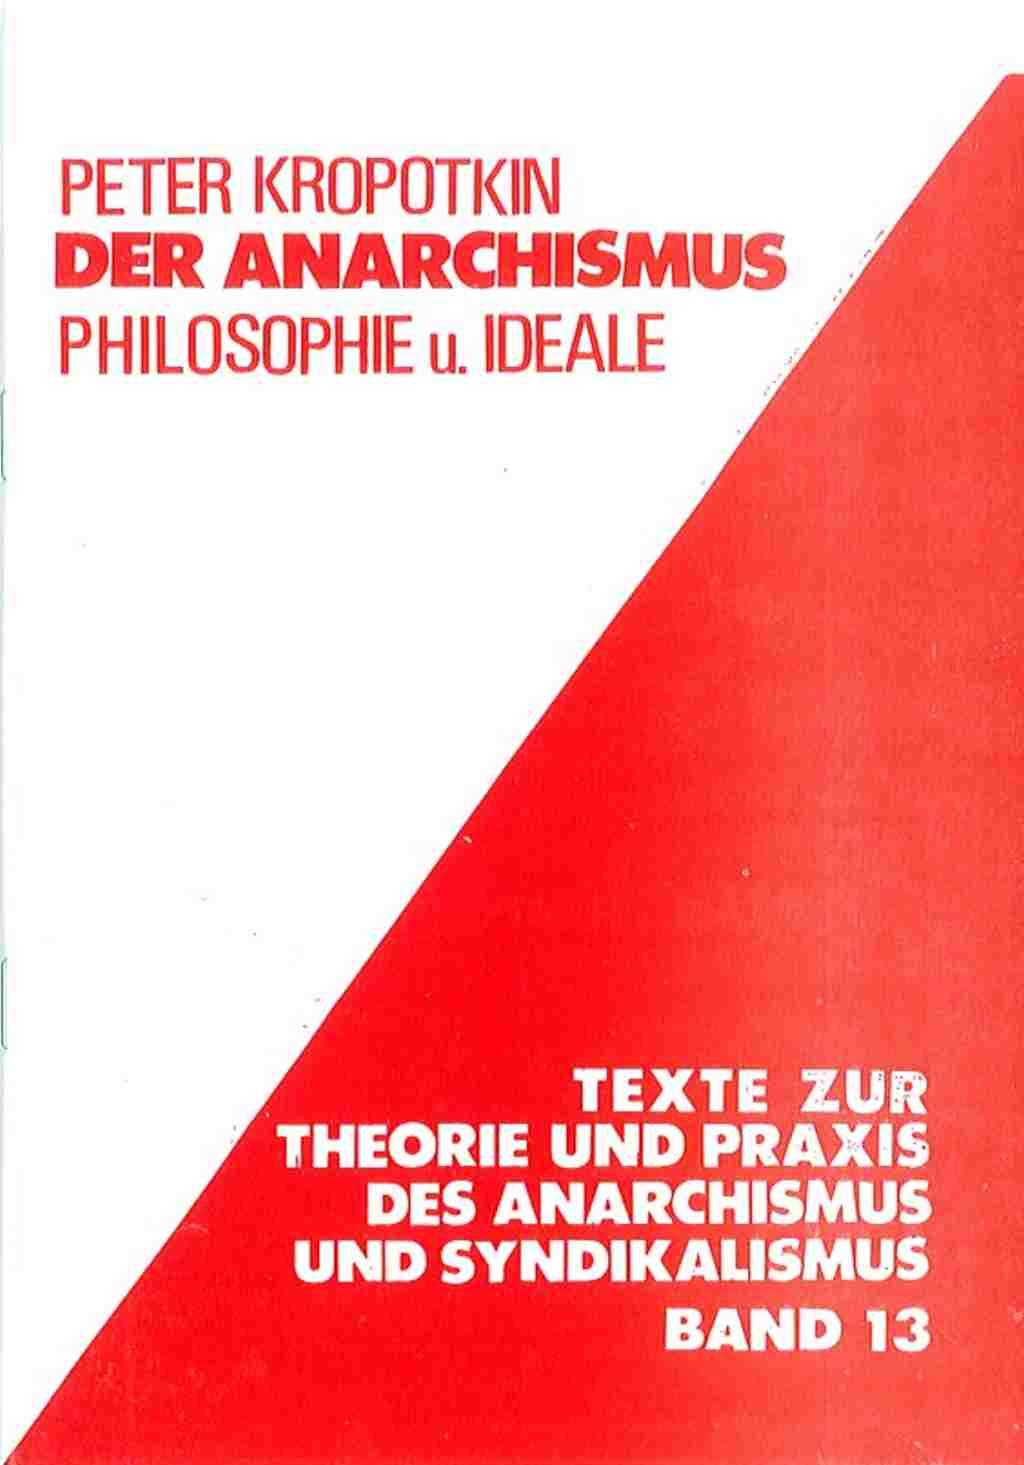 Kropotkin Philosophie